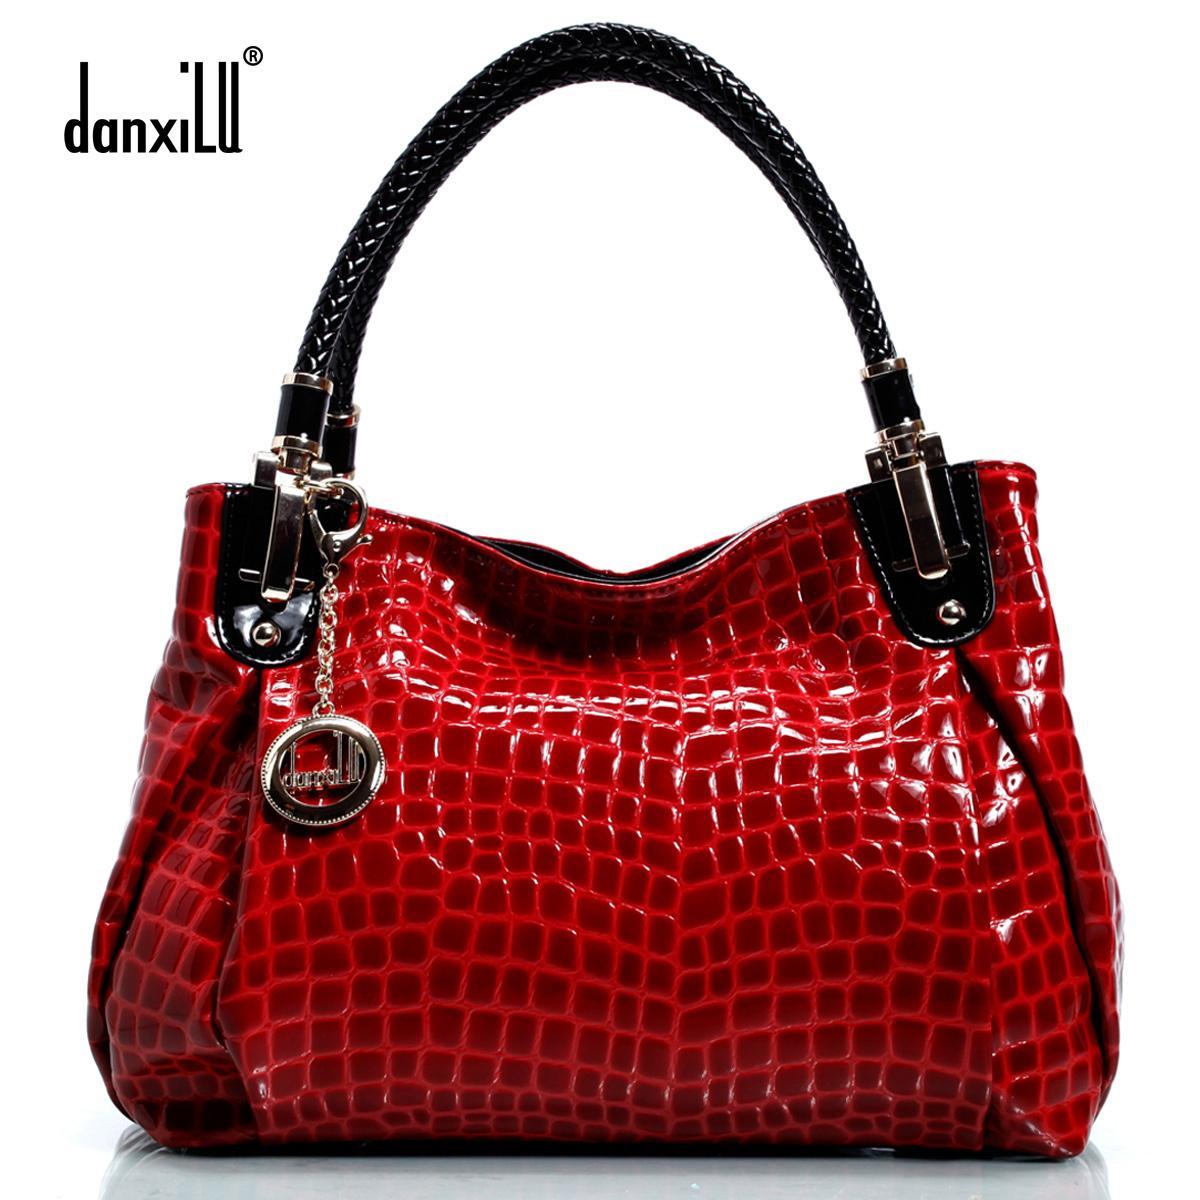 Women's handbag 2013 spring and summer vintage cowhide handbag shoulder bag best selling hit hot product free shipping(China (Mainland))